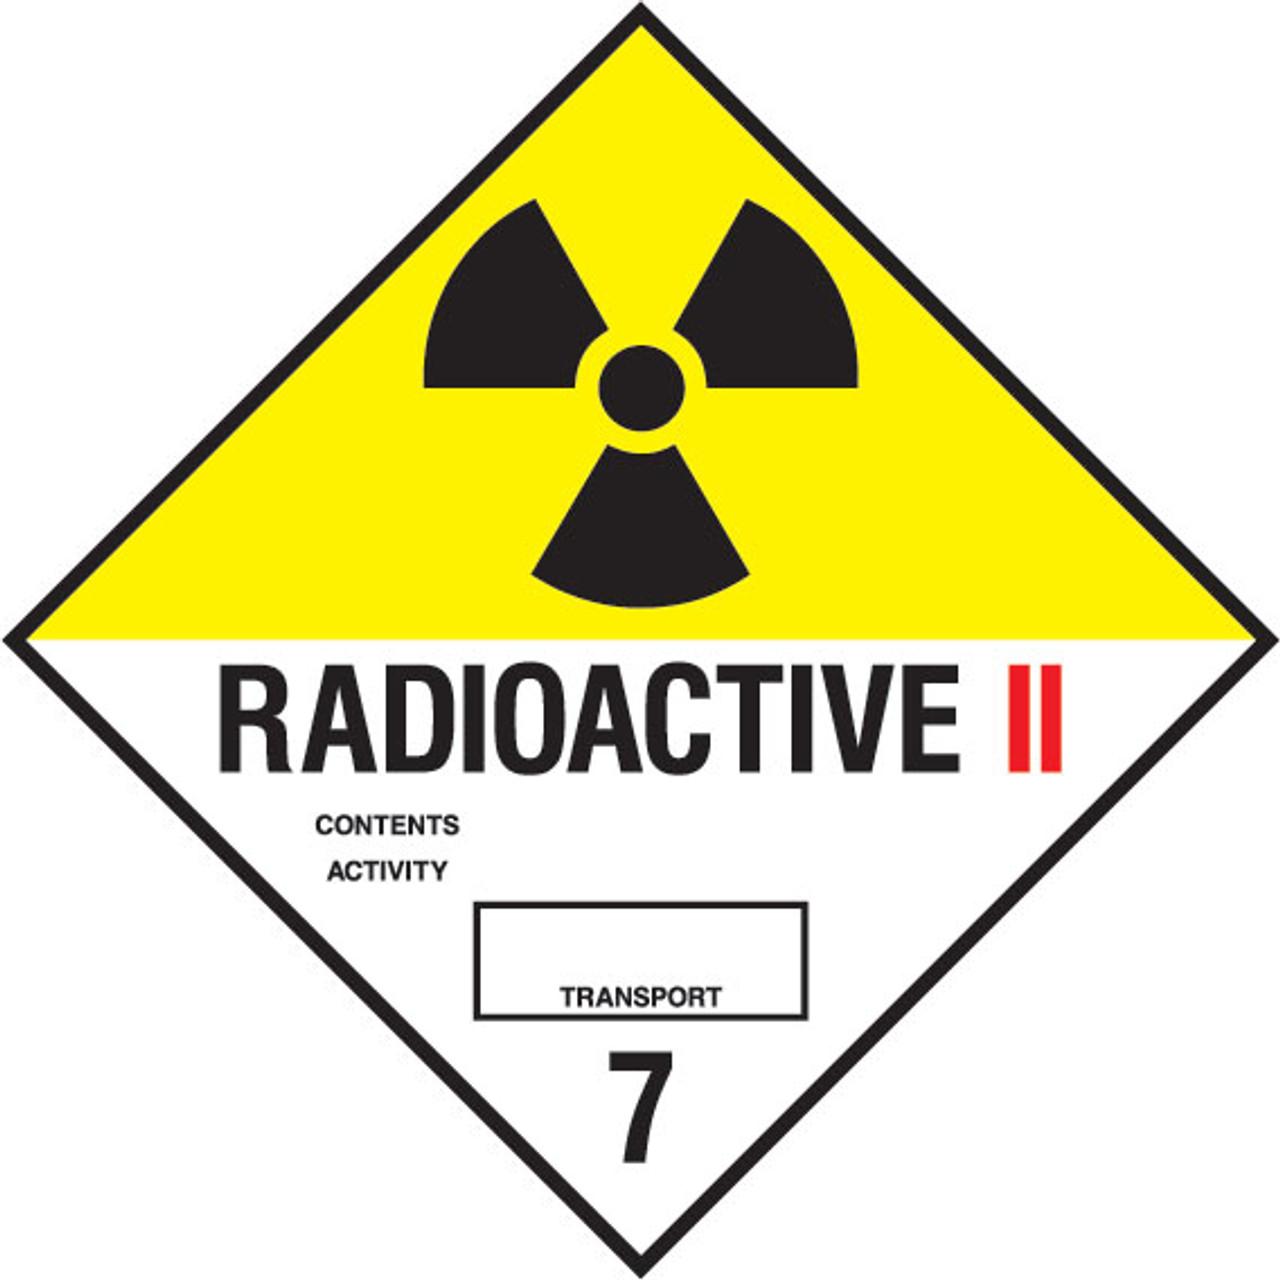 Radioactive II